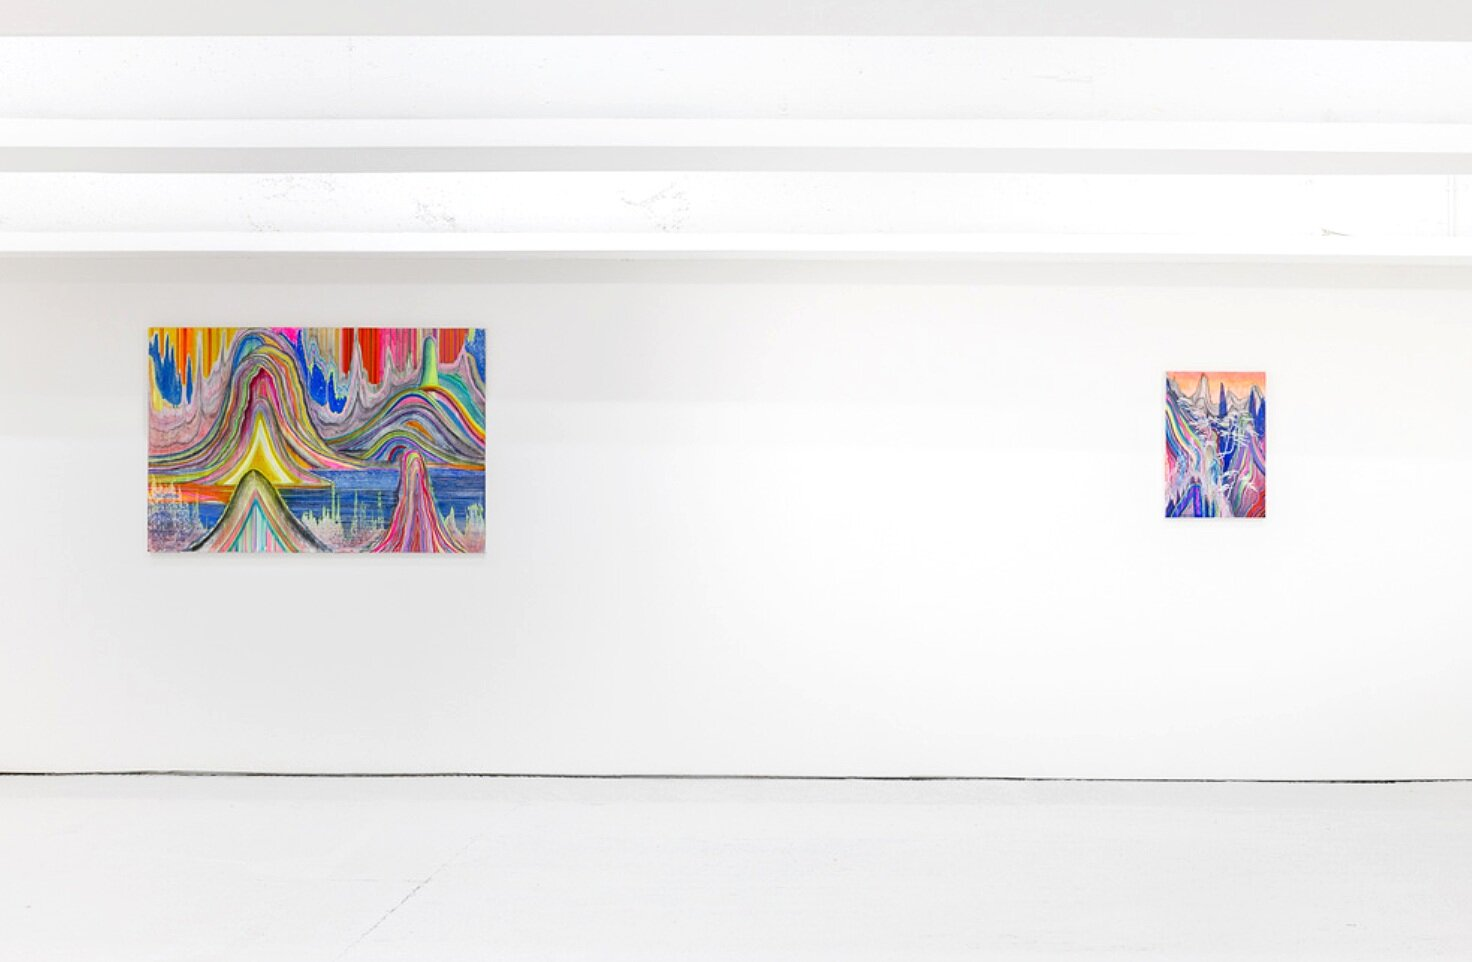 Courtesy of König Galerie, London.